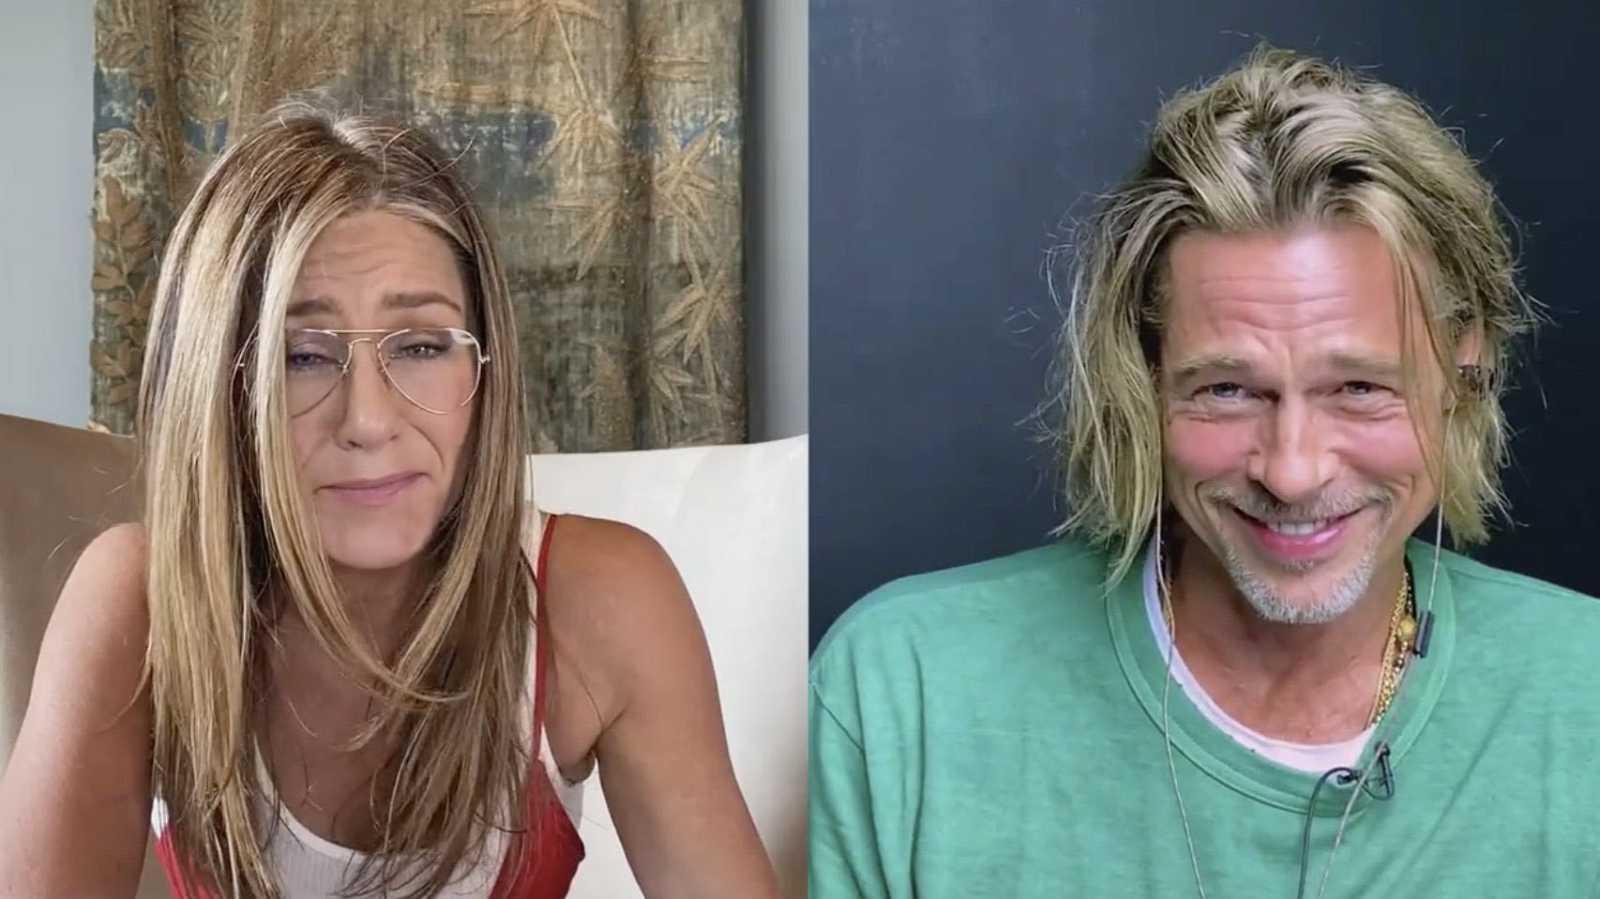 El esperado reencuentro de Brad Pitt y Jennifer Aniston